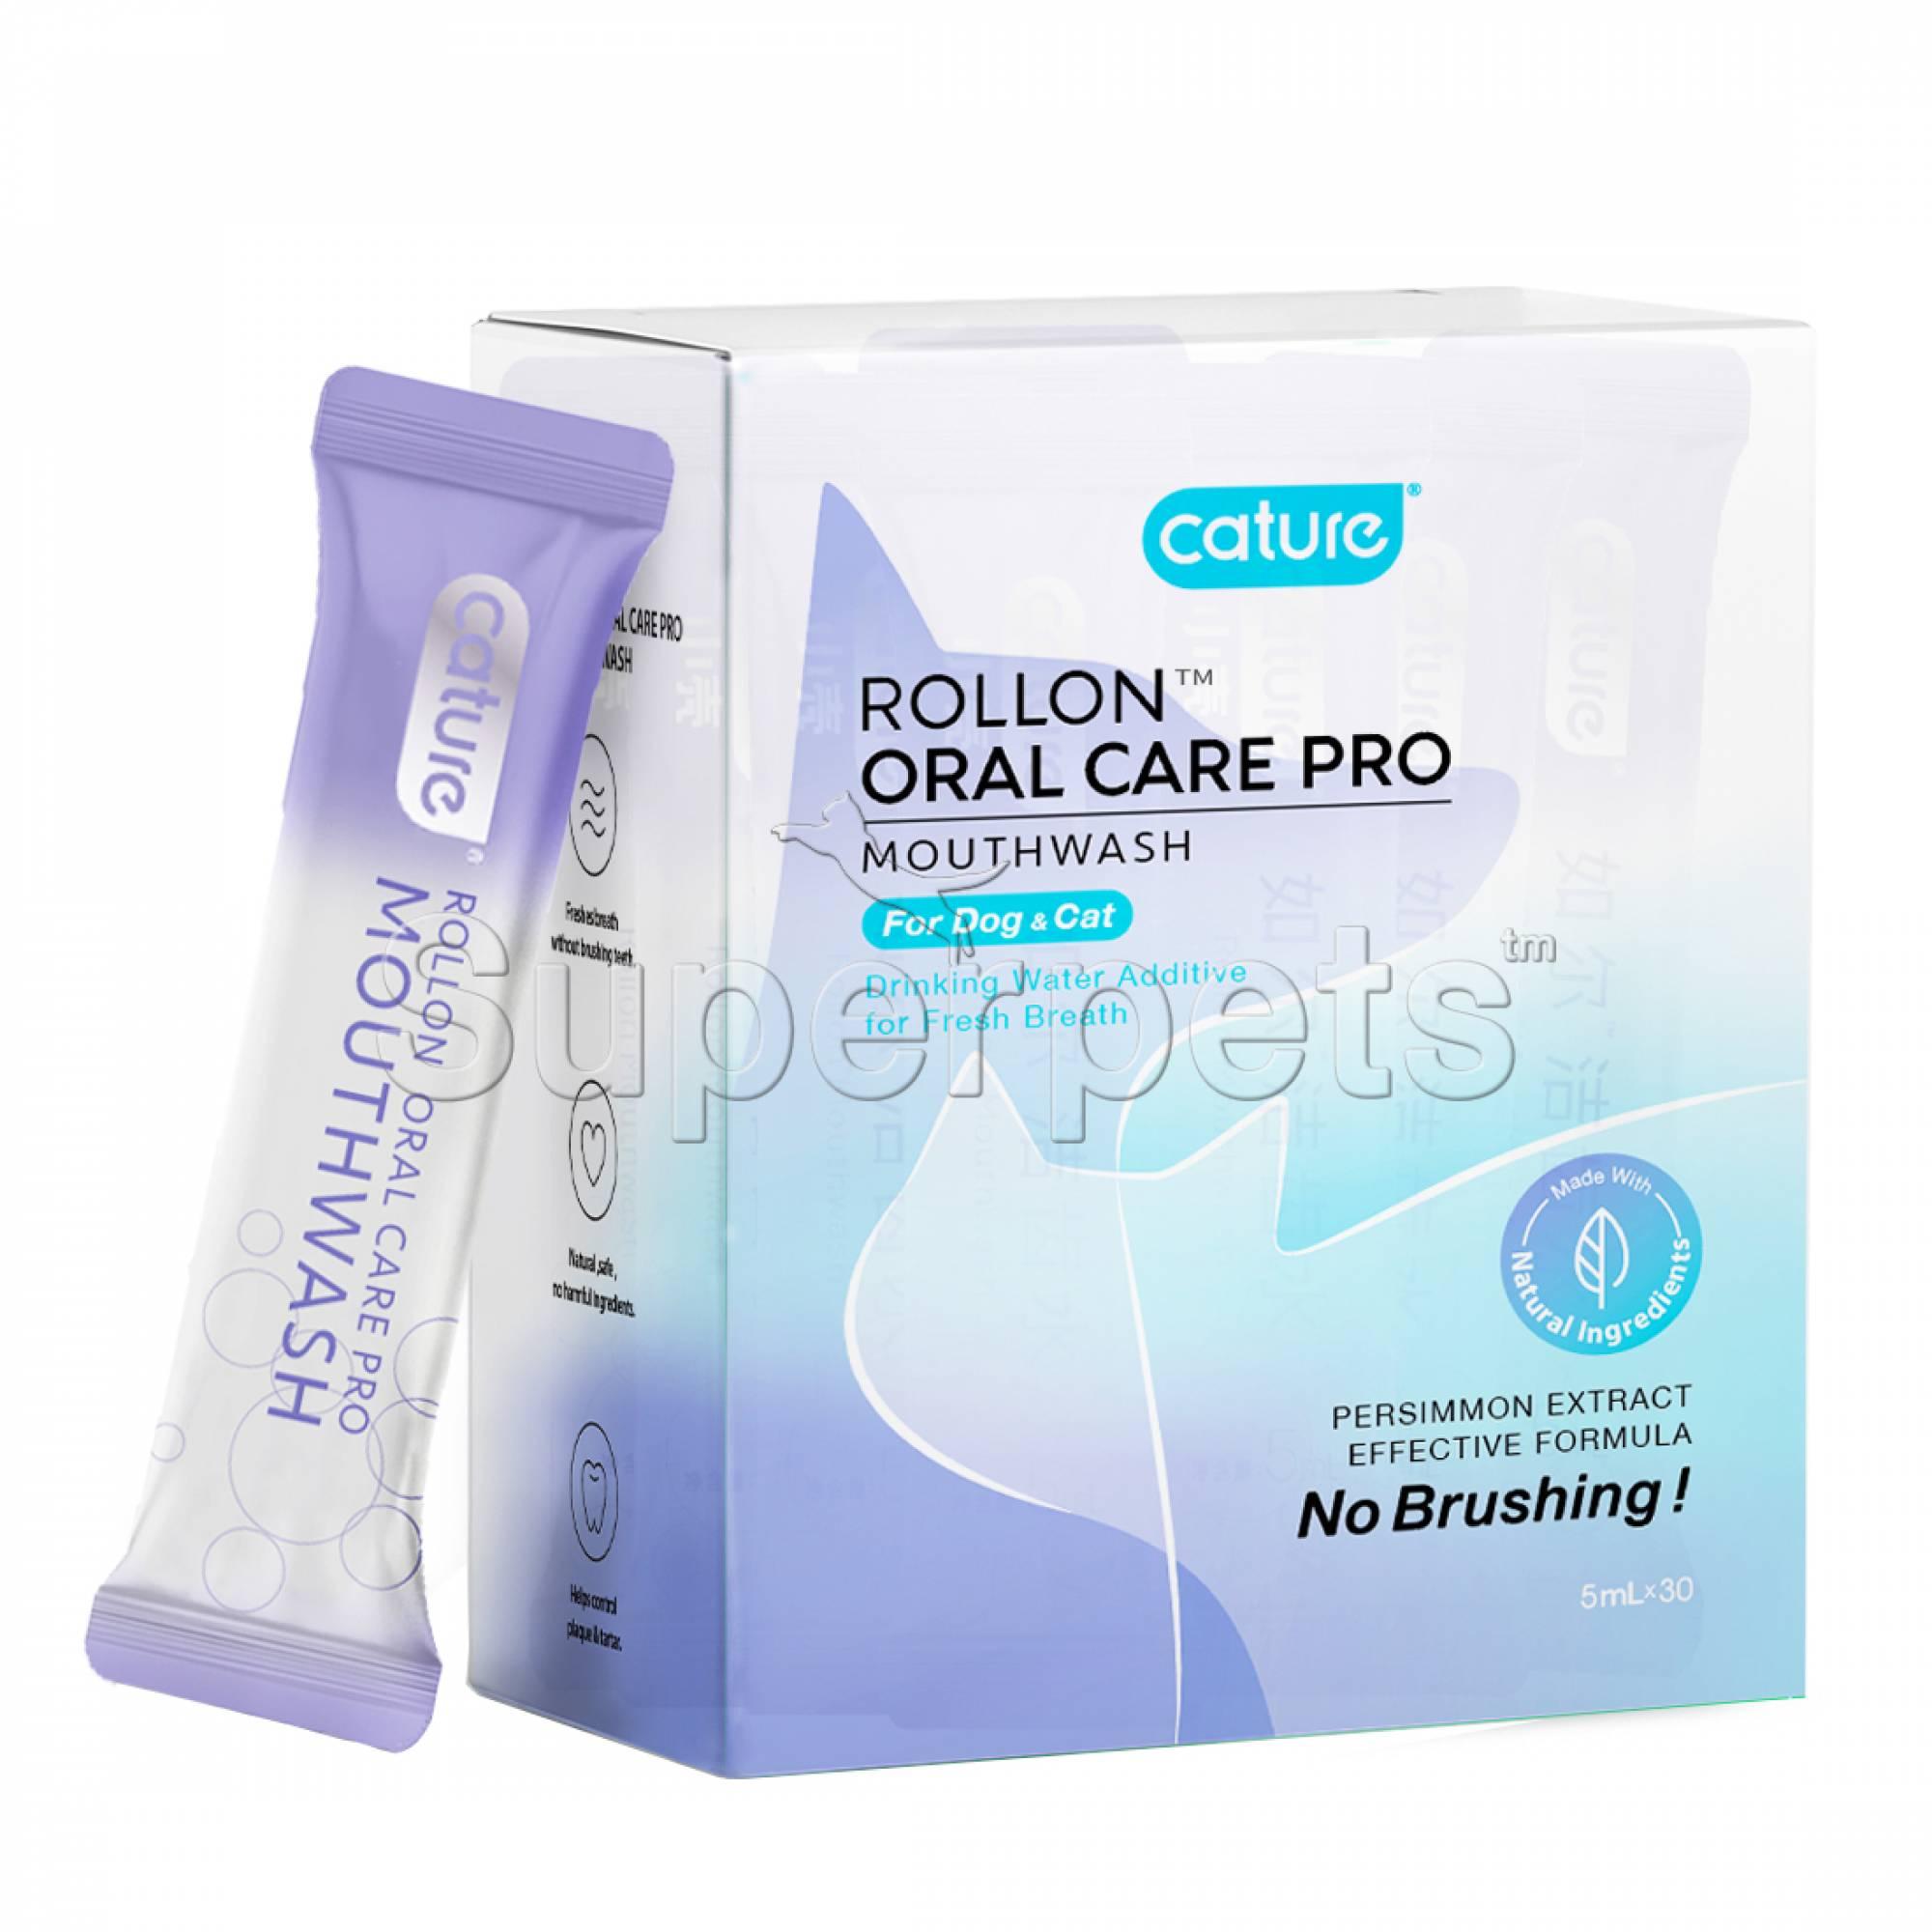 Cature Rollon Oral Care Pro Mouthwash for Dog & Cat 30x5ml